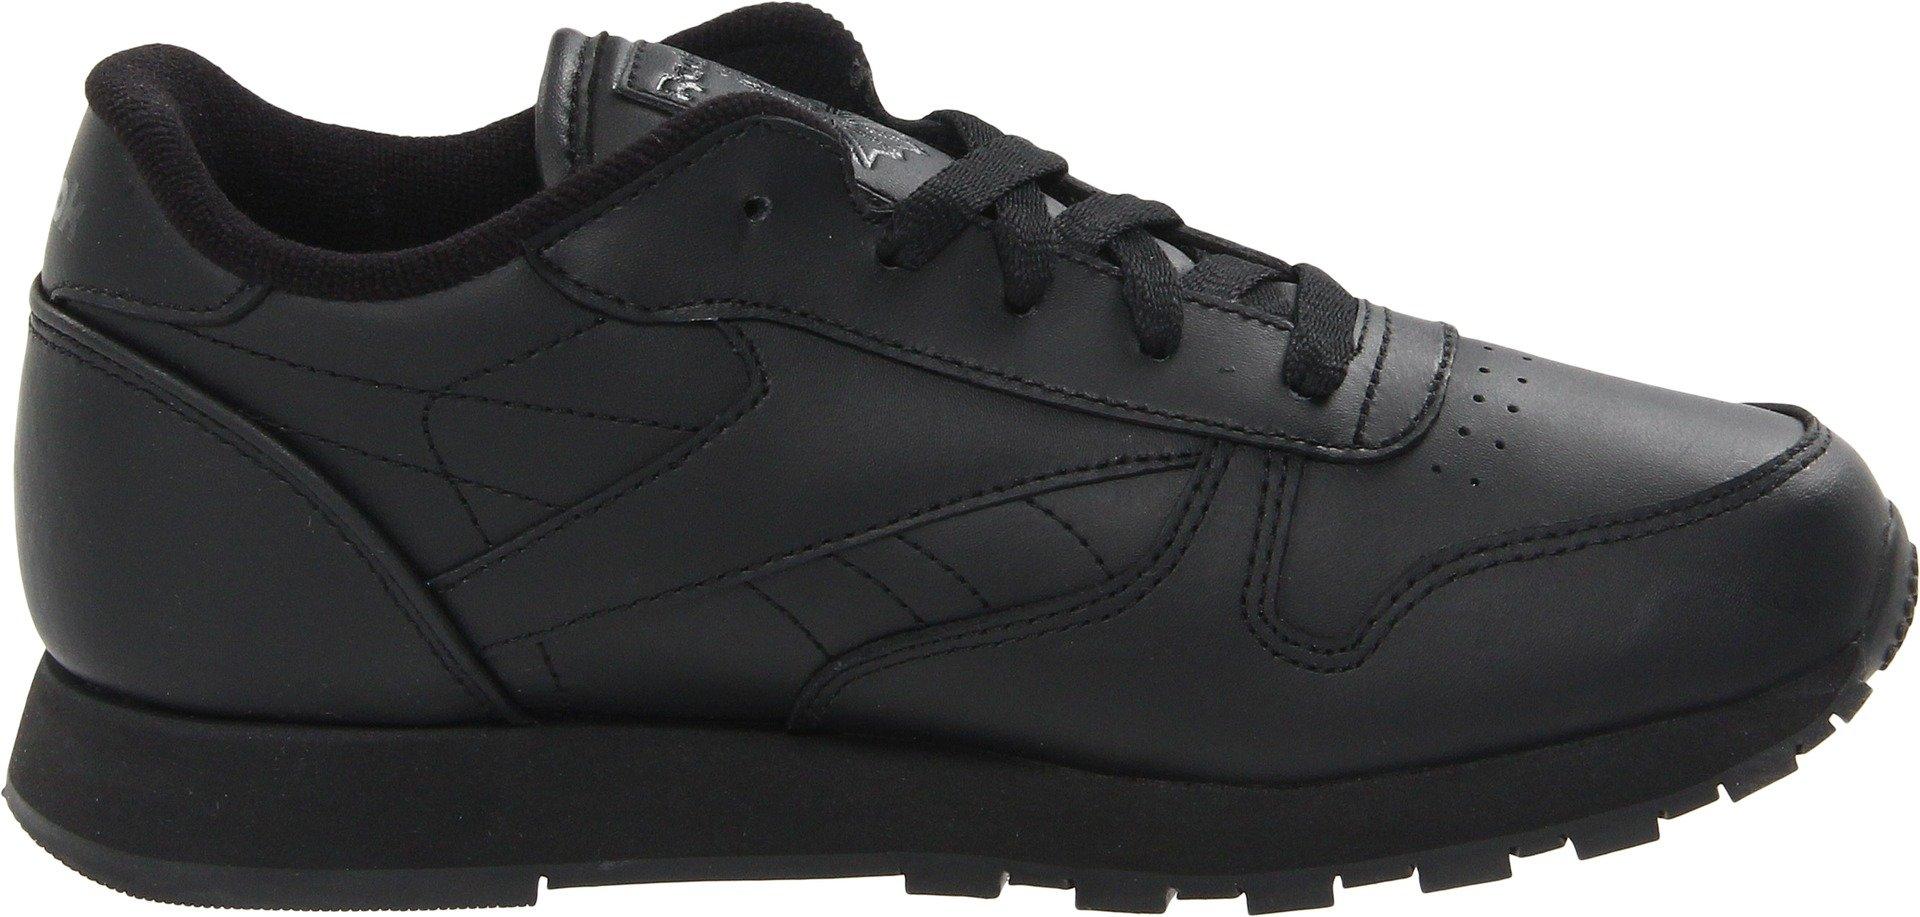 Reebok Classic Leather Shoe,Black/Black/Black,11.5 M US Little Kid by Reebok (Image #6)